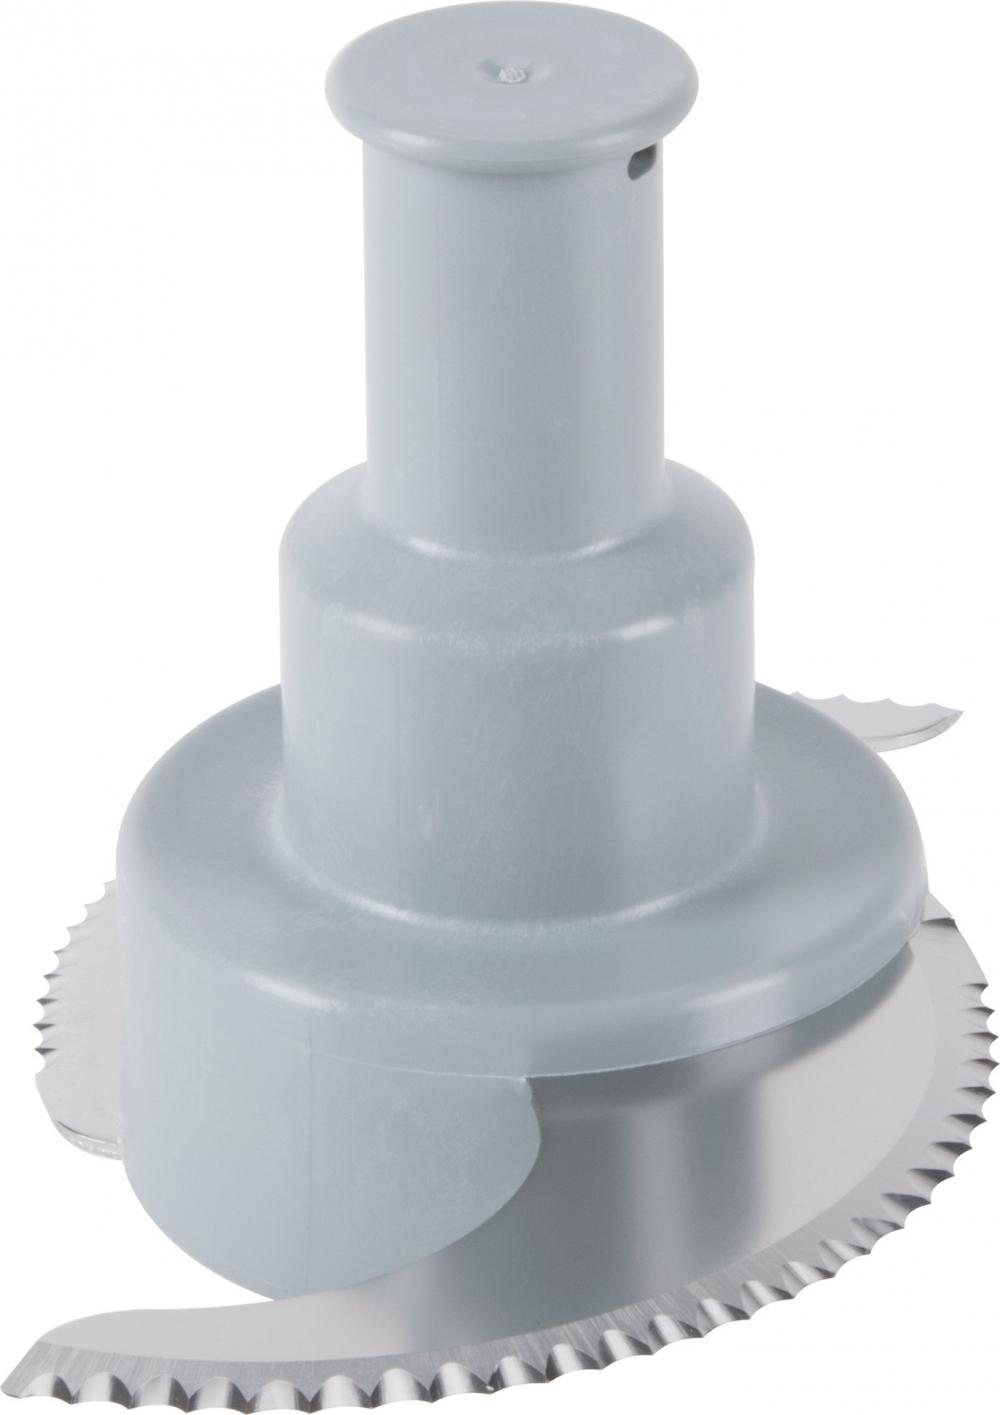 Зубчатый нож Robot Coupe 27121 - 2